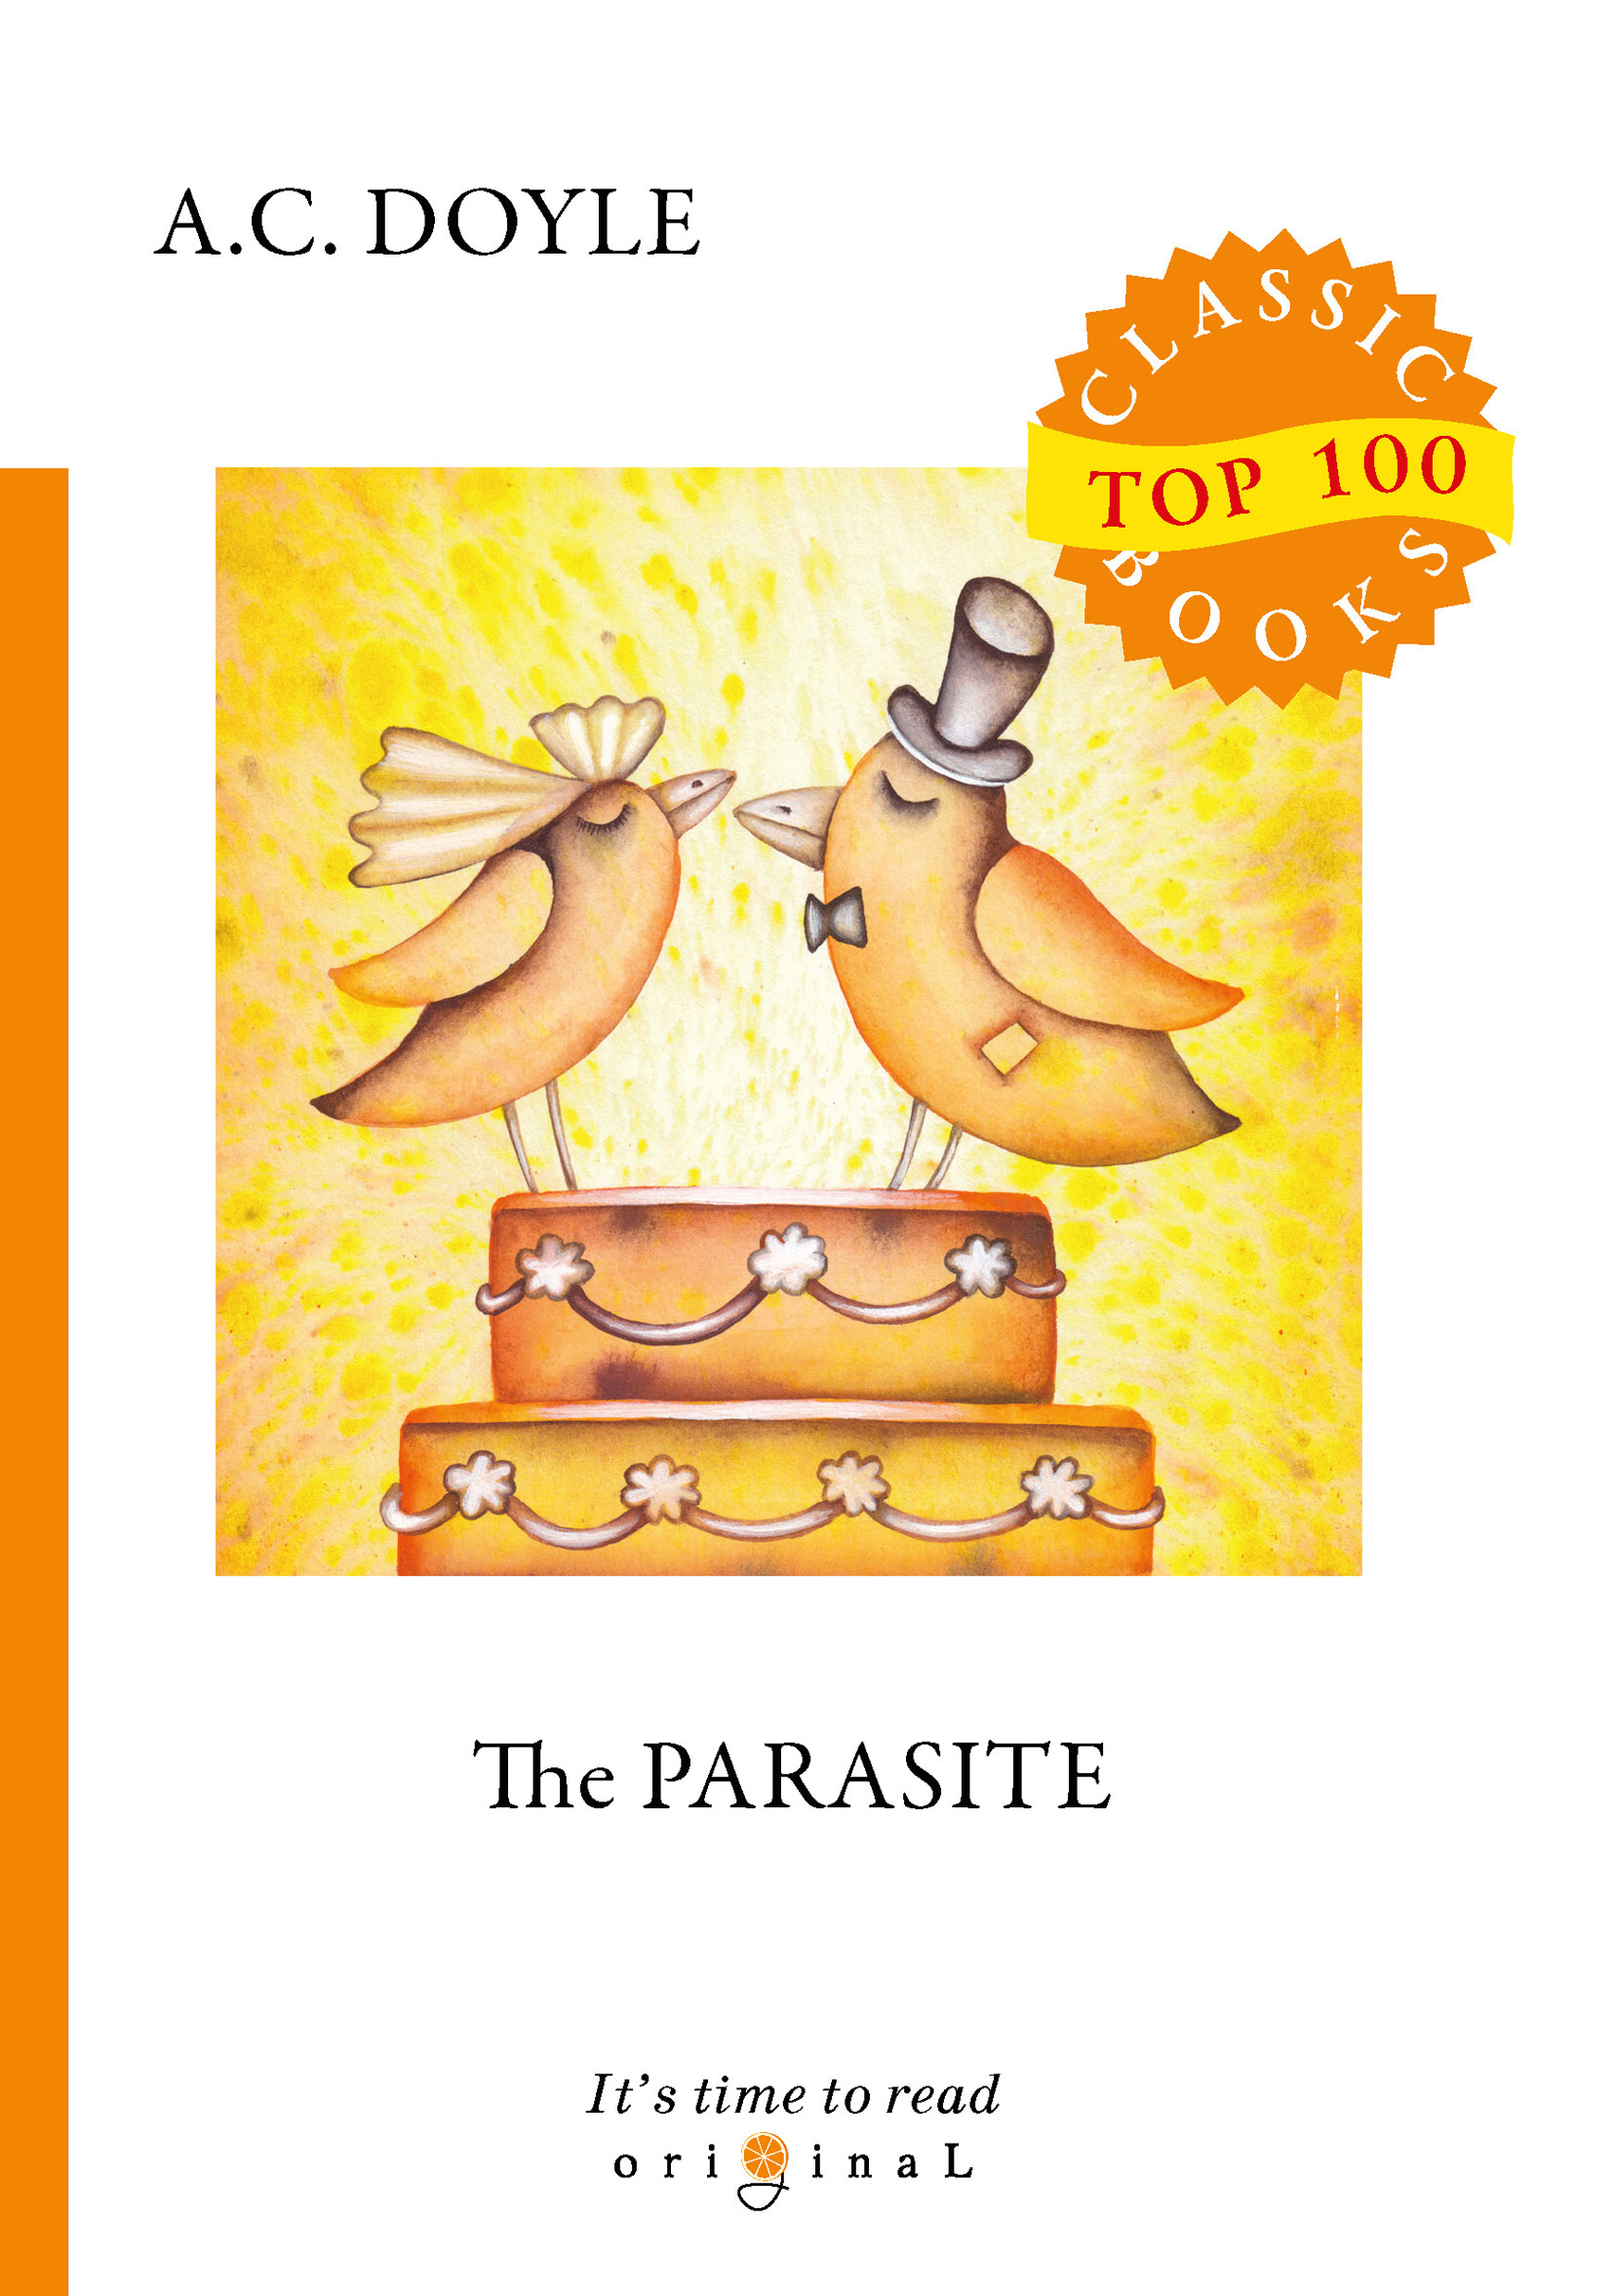 A. C. Doyle The Parasite arthur conan doyle collected short stories iv the parasite